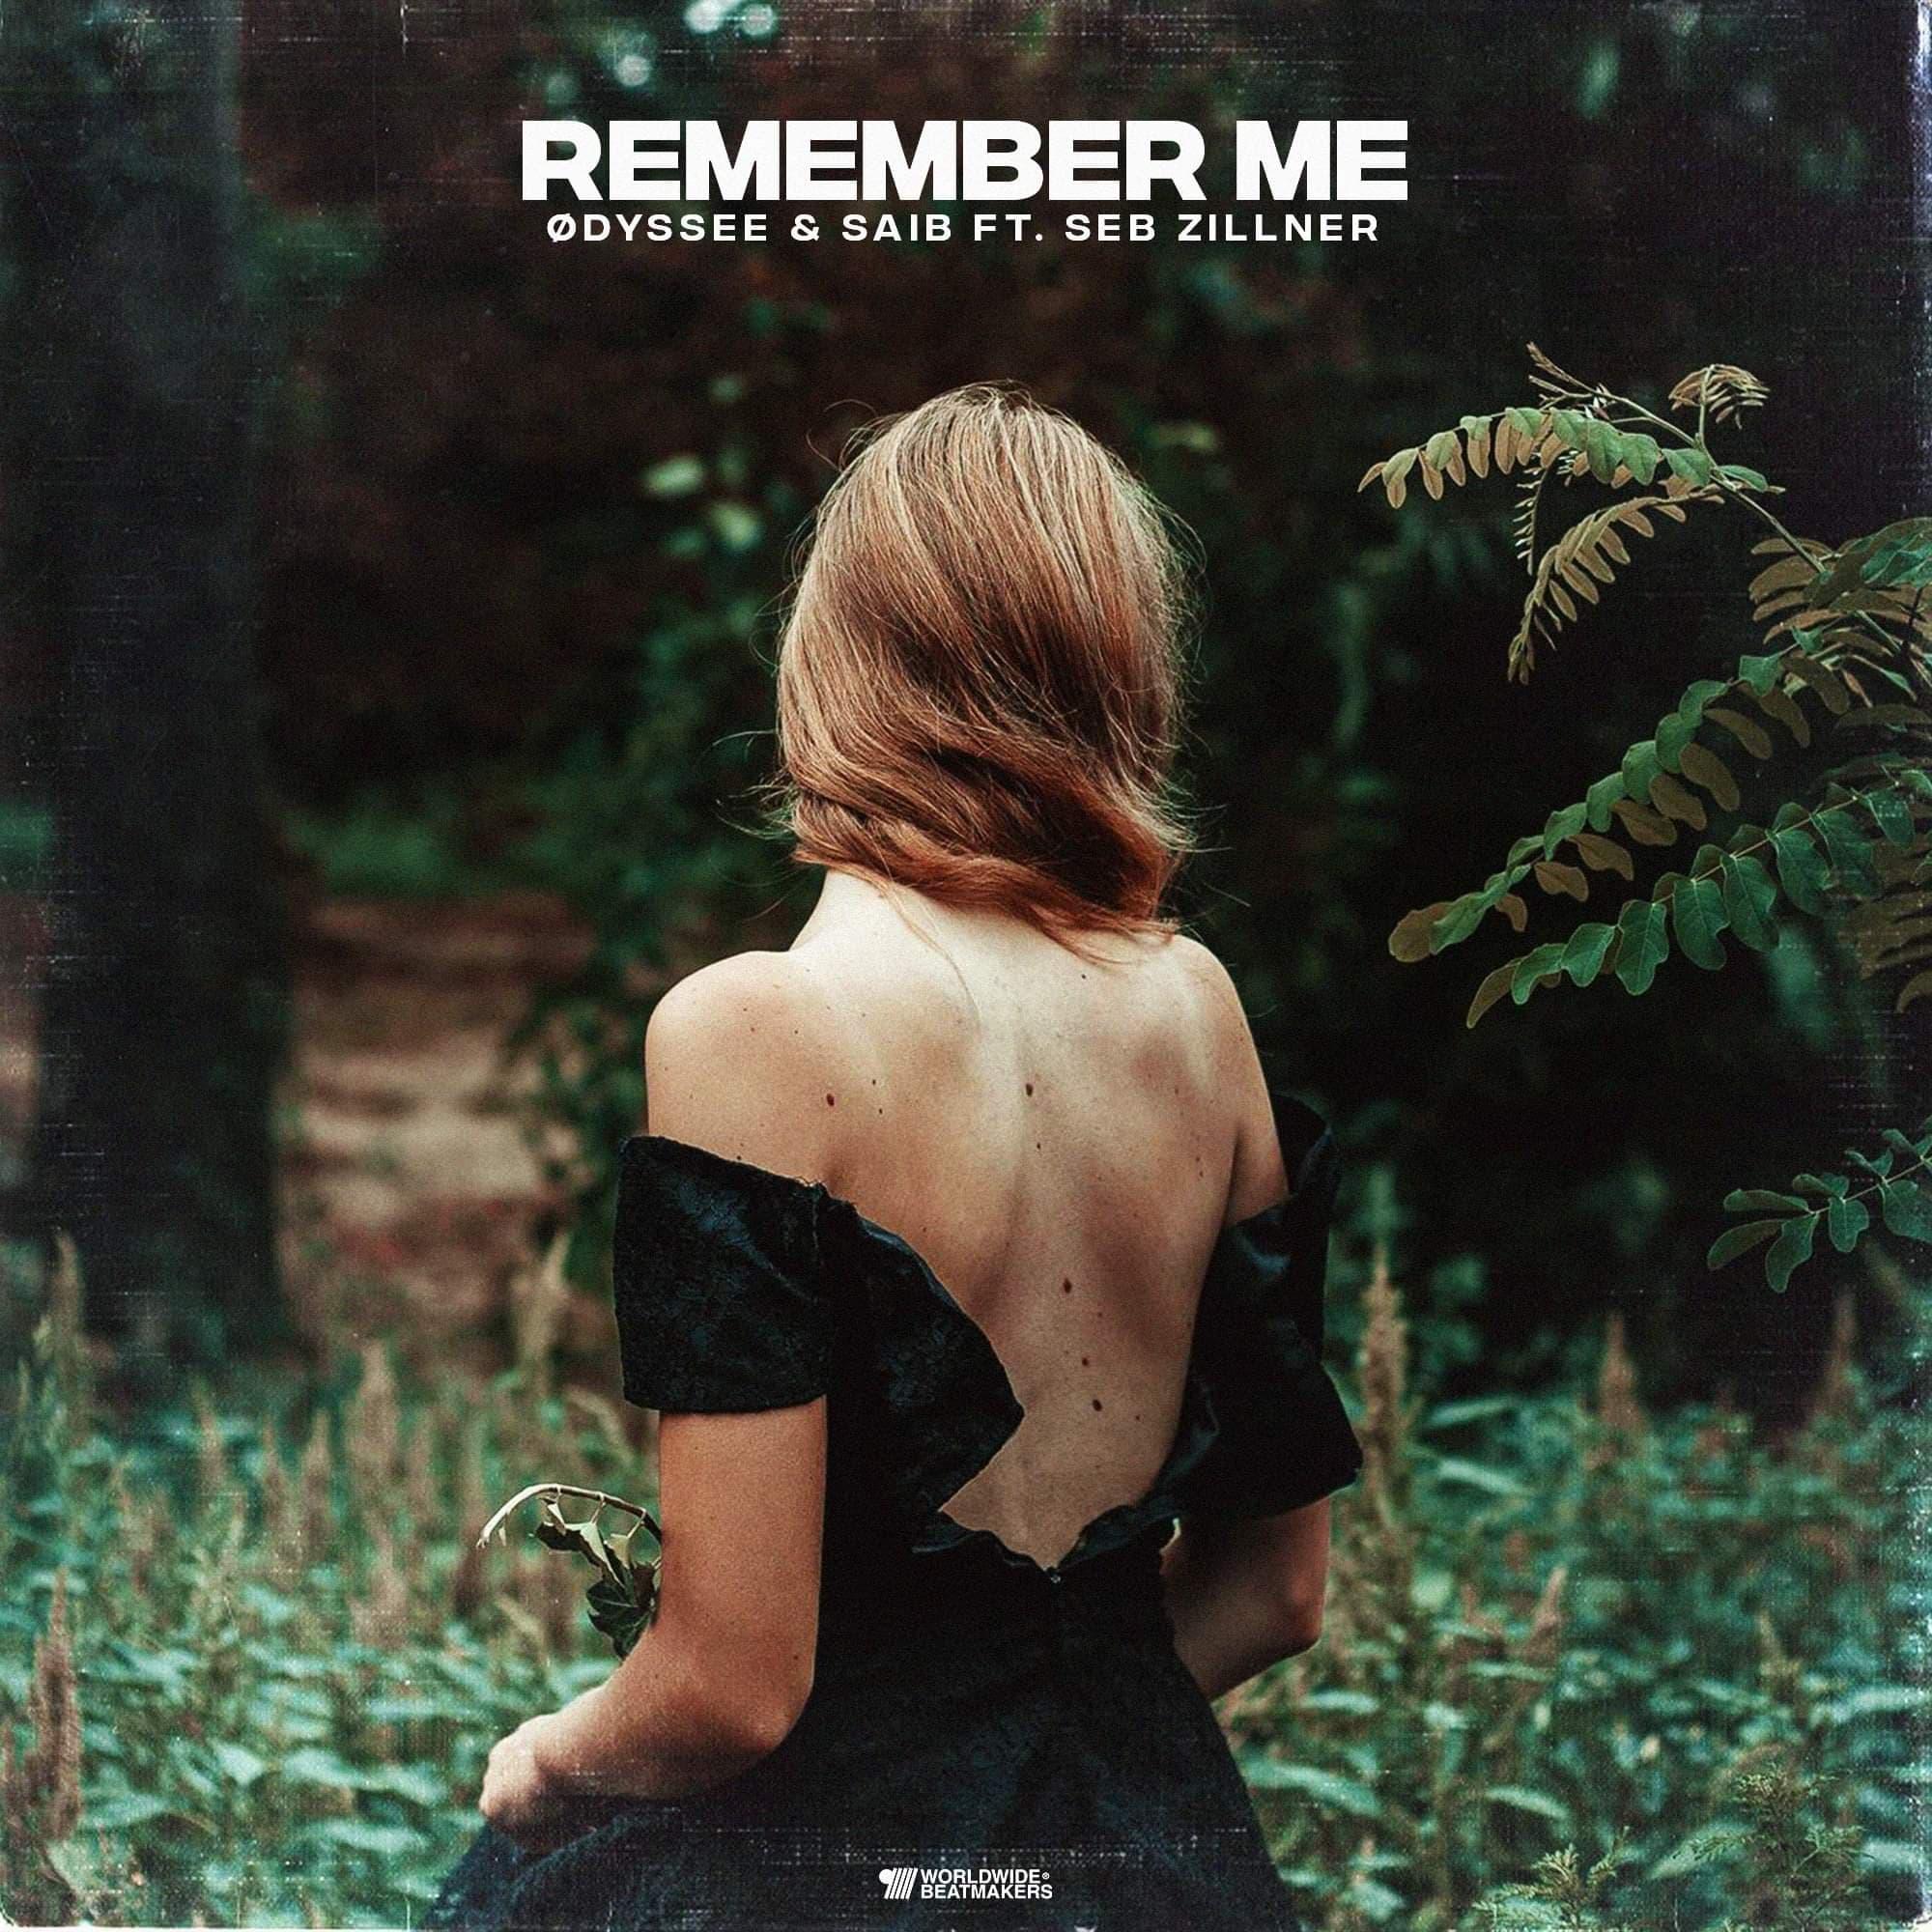 ØDYSSEE & Saib feat. Seb Zillner - Remember Me   Saxophone Seb Zillner   © 2019 NINETOFIVE  Listen on   Spotify